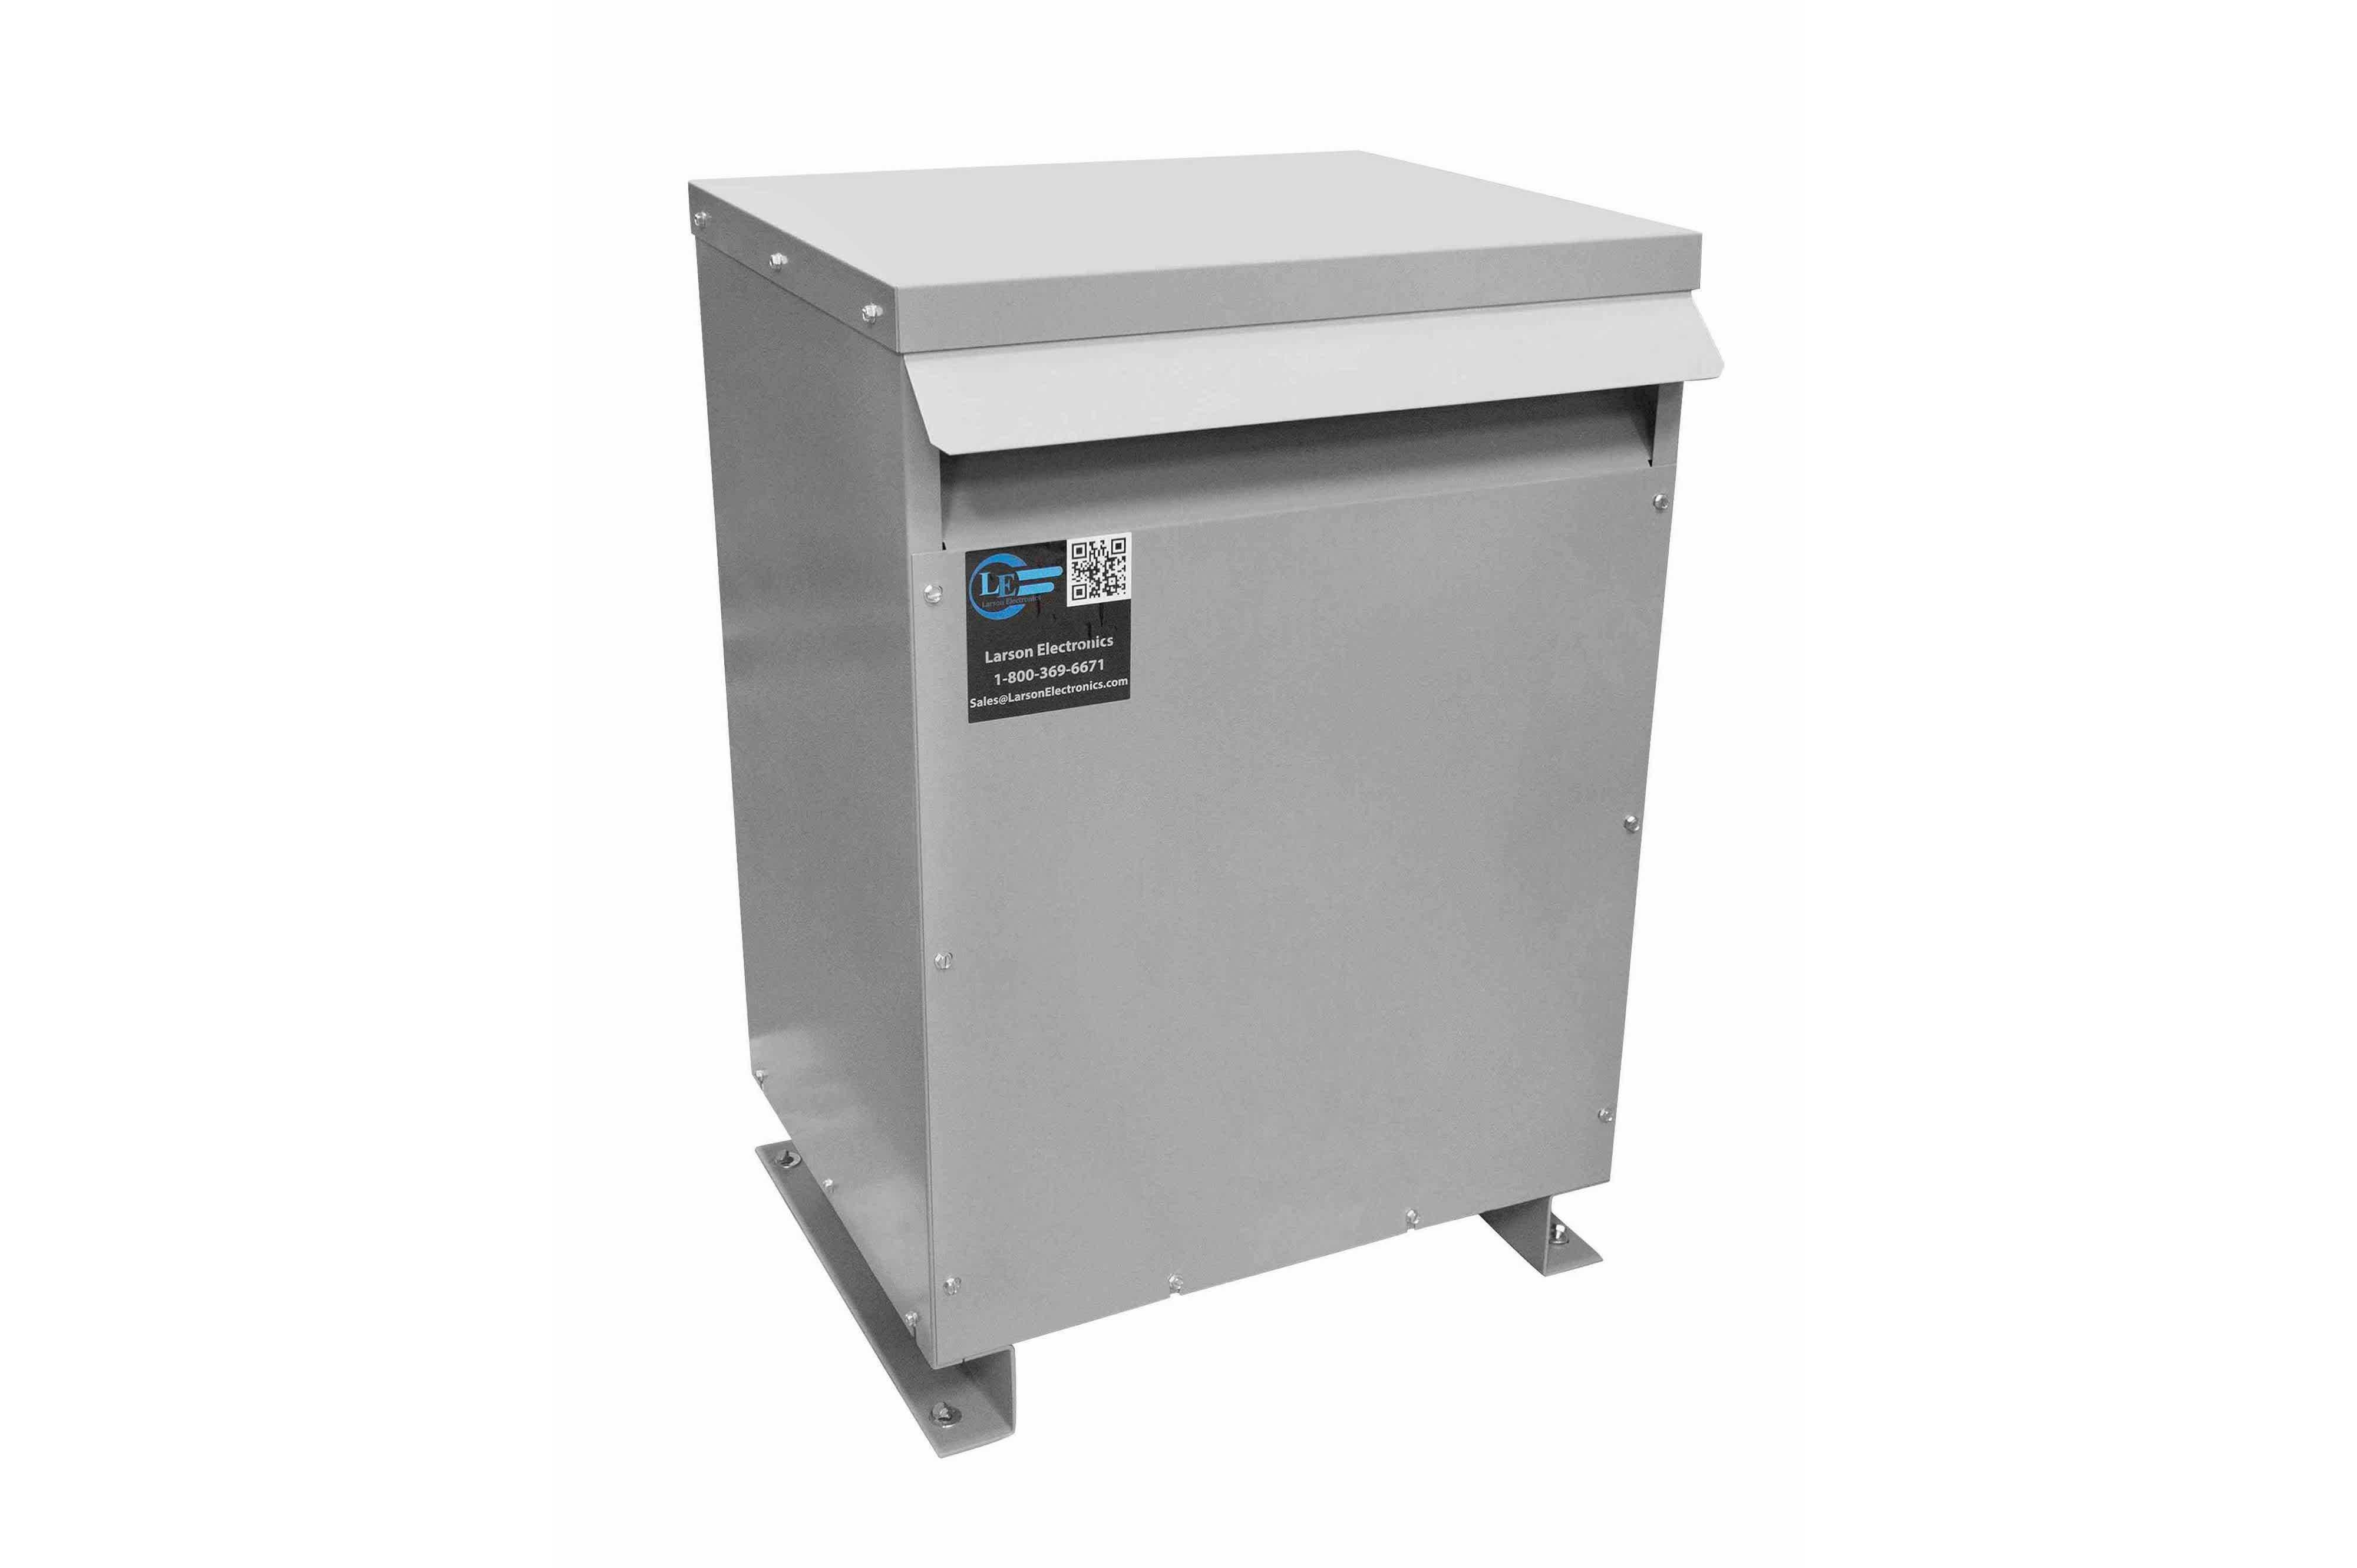 29 kVA 3PH Isolation Transformer, 415V Wye Primary, 208Y/120 Wye-N Secondary, N3R, Ventilated, 60 Hz